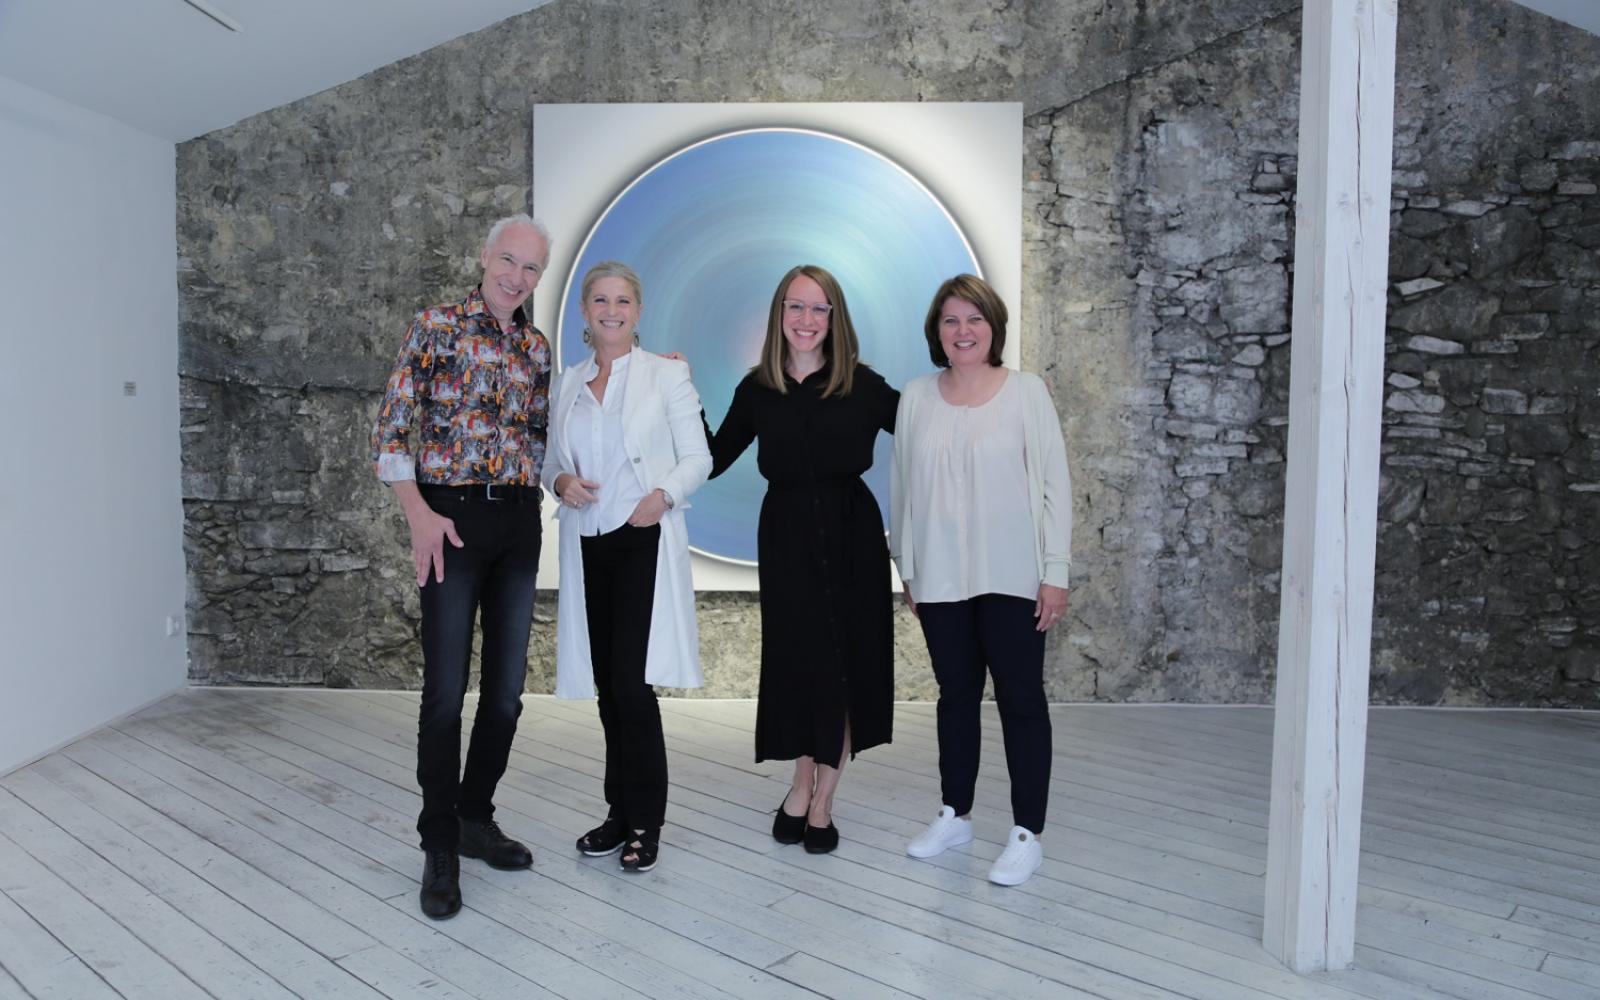 Das Team der L.art GALERIE: Herwig Loidl, Ingrid Skovhus, Lisa Koch, Judith Legat